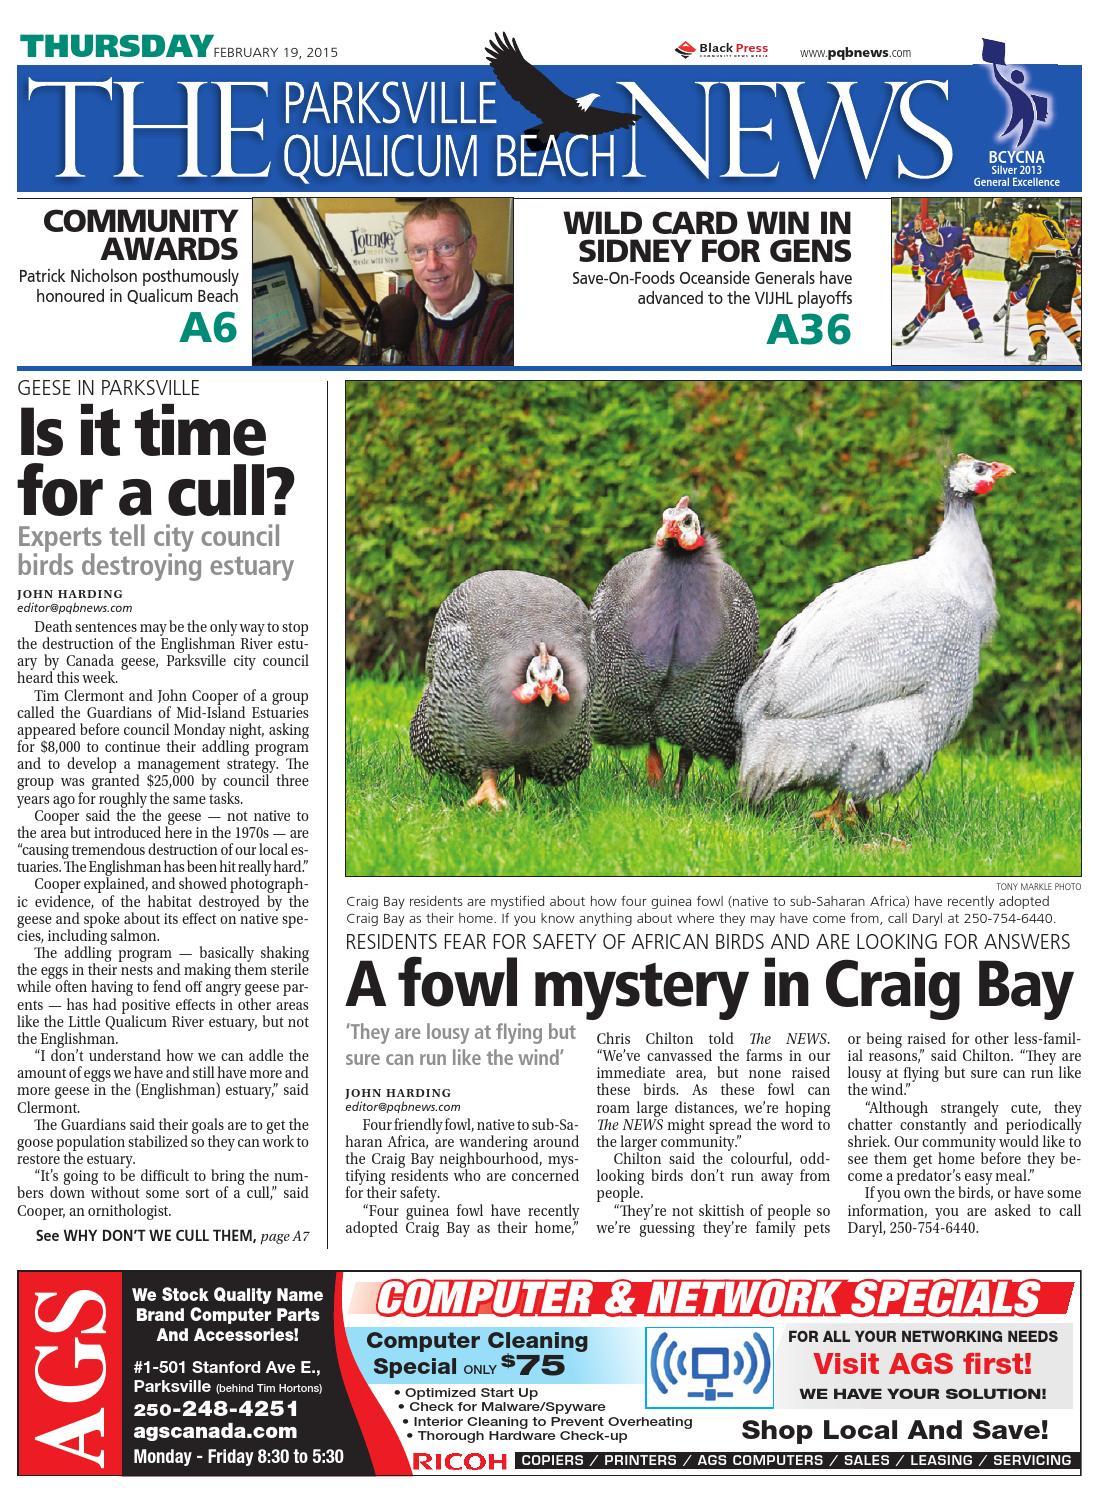 Parksville Qualicum Beach News, February 19, 2015 by Black Press - issuu